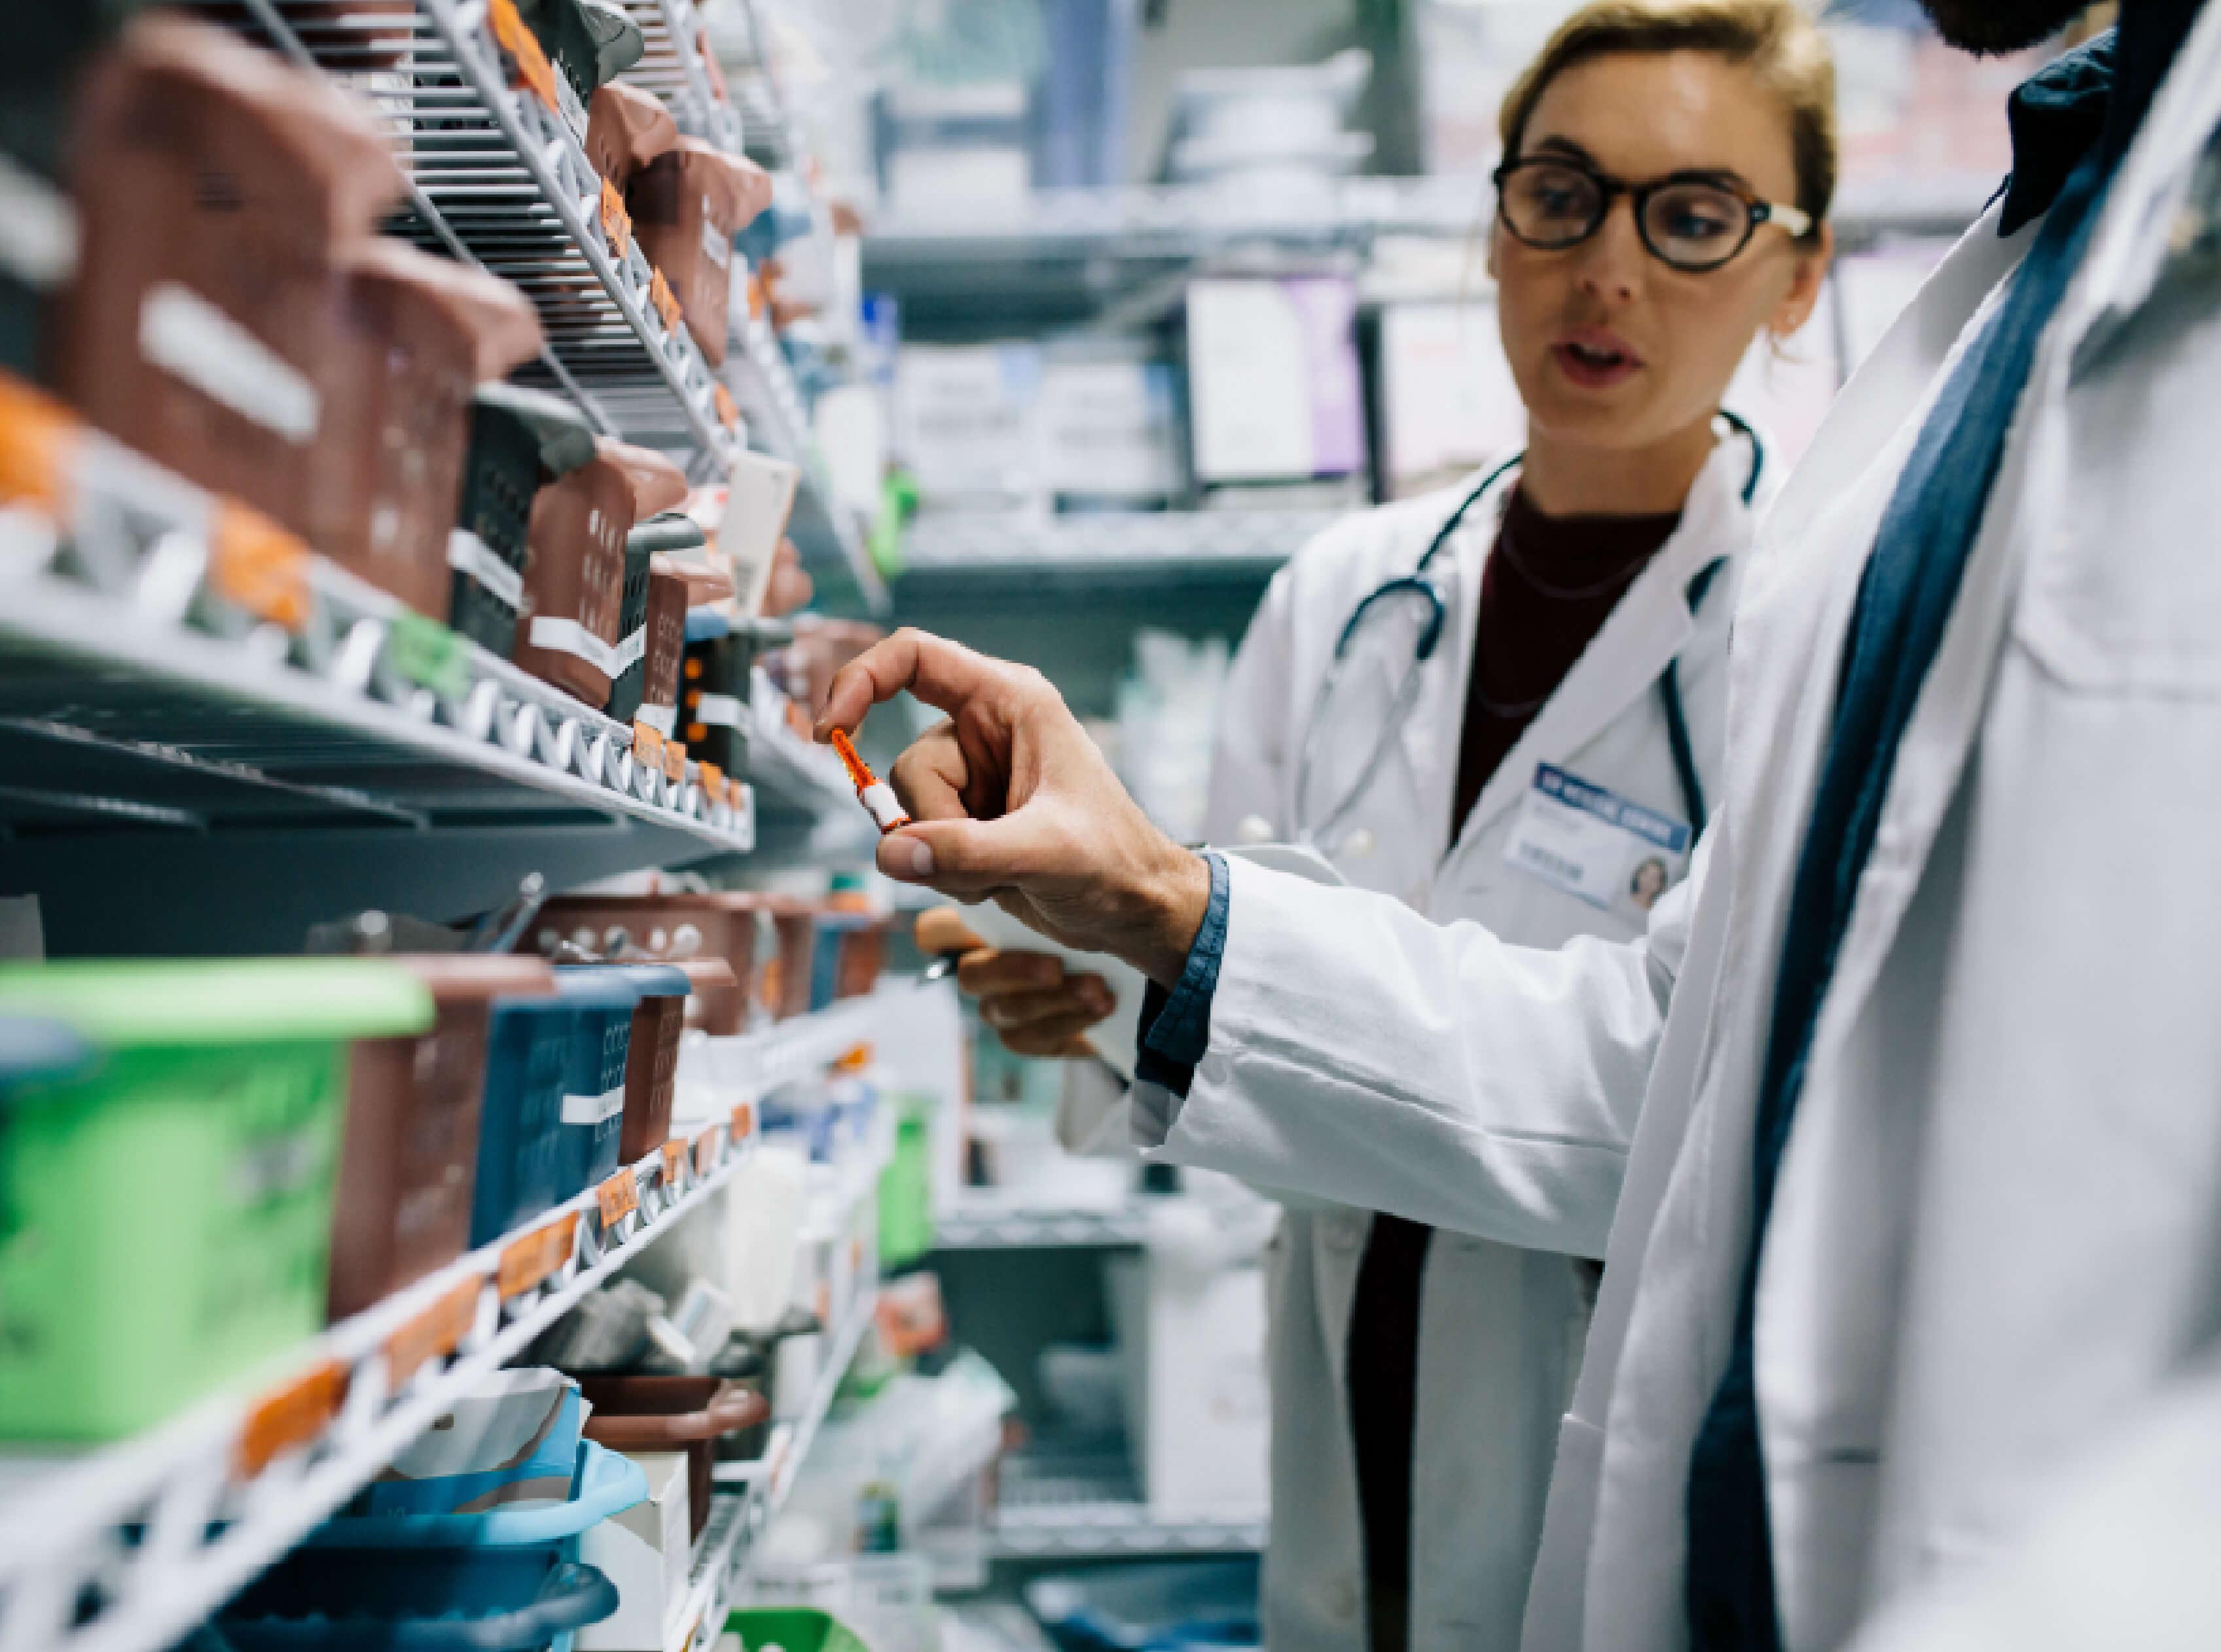 Amazon in Medical Supplies - Wholesalers Beware and Prepare